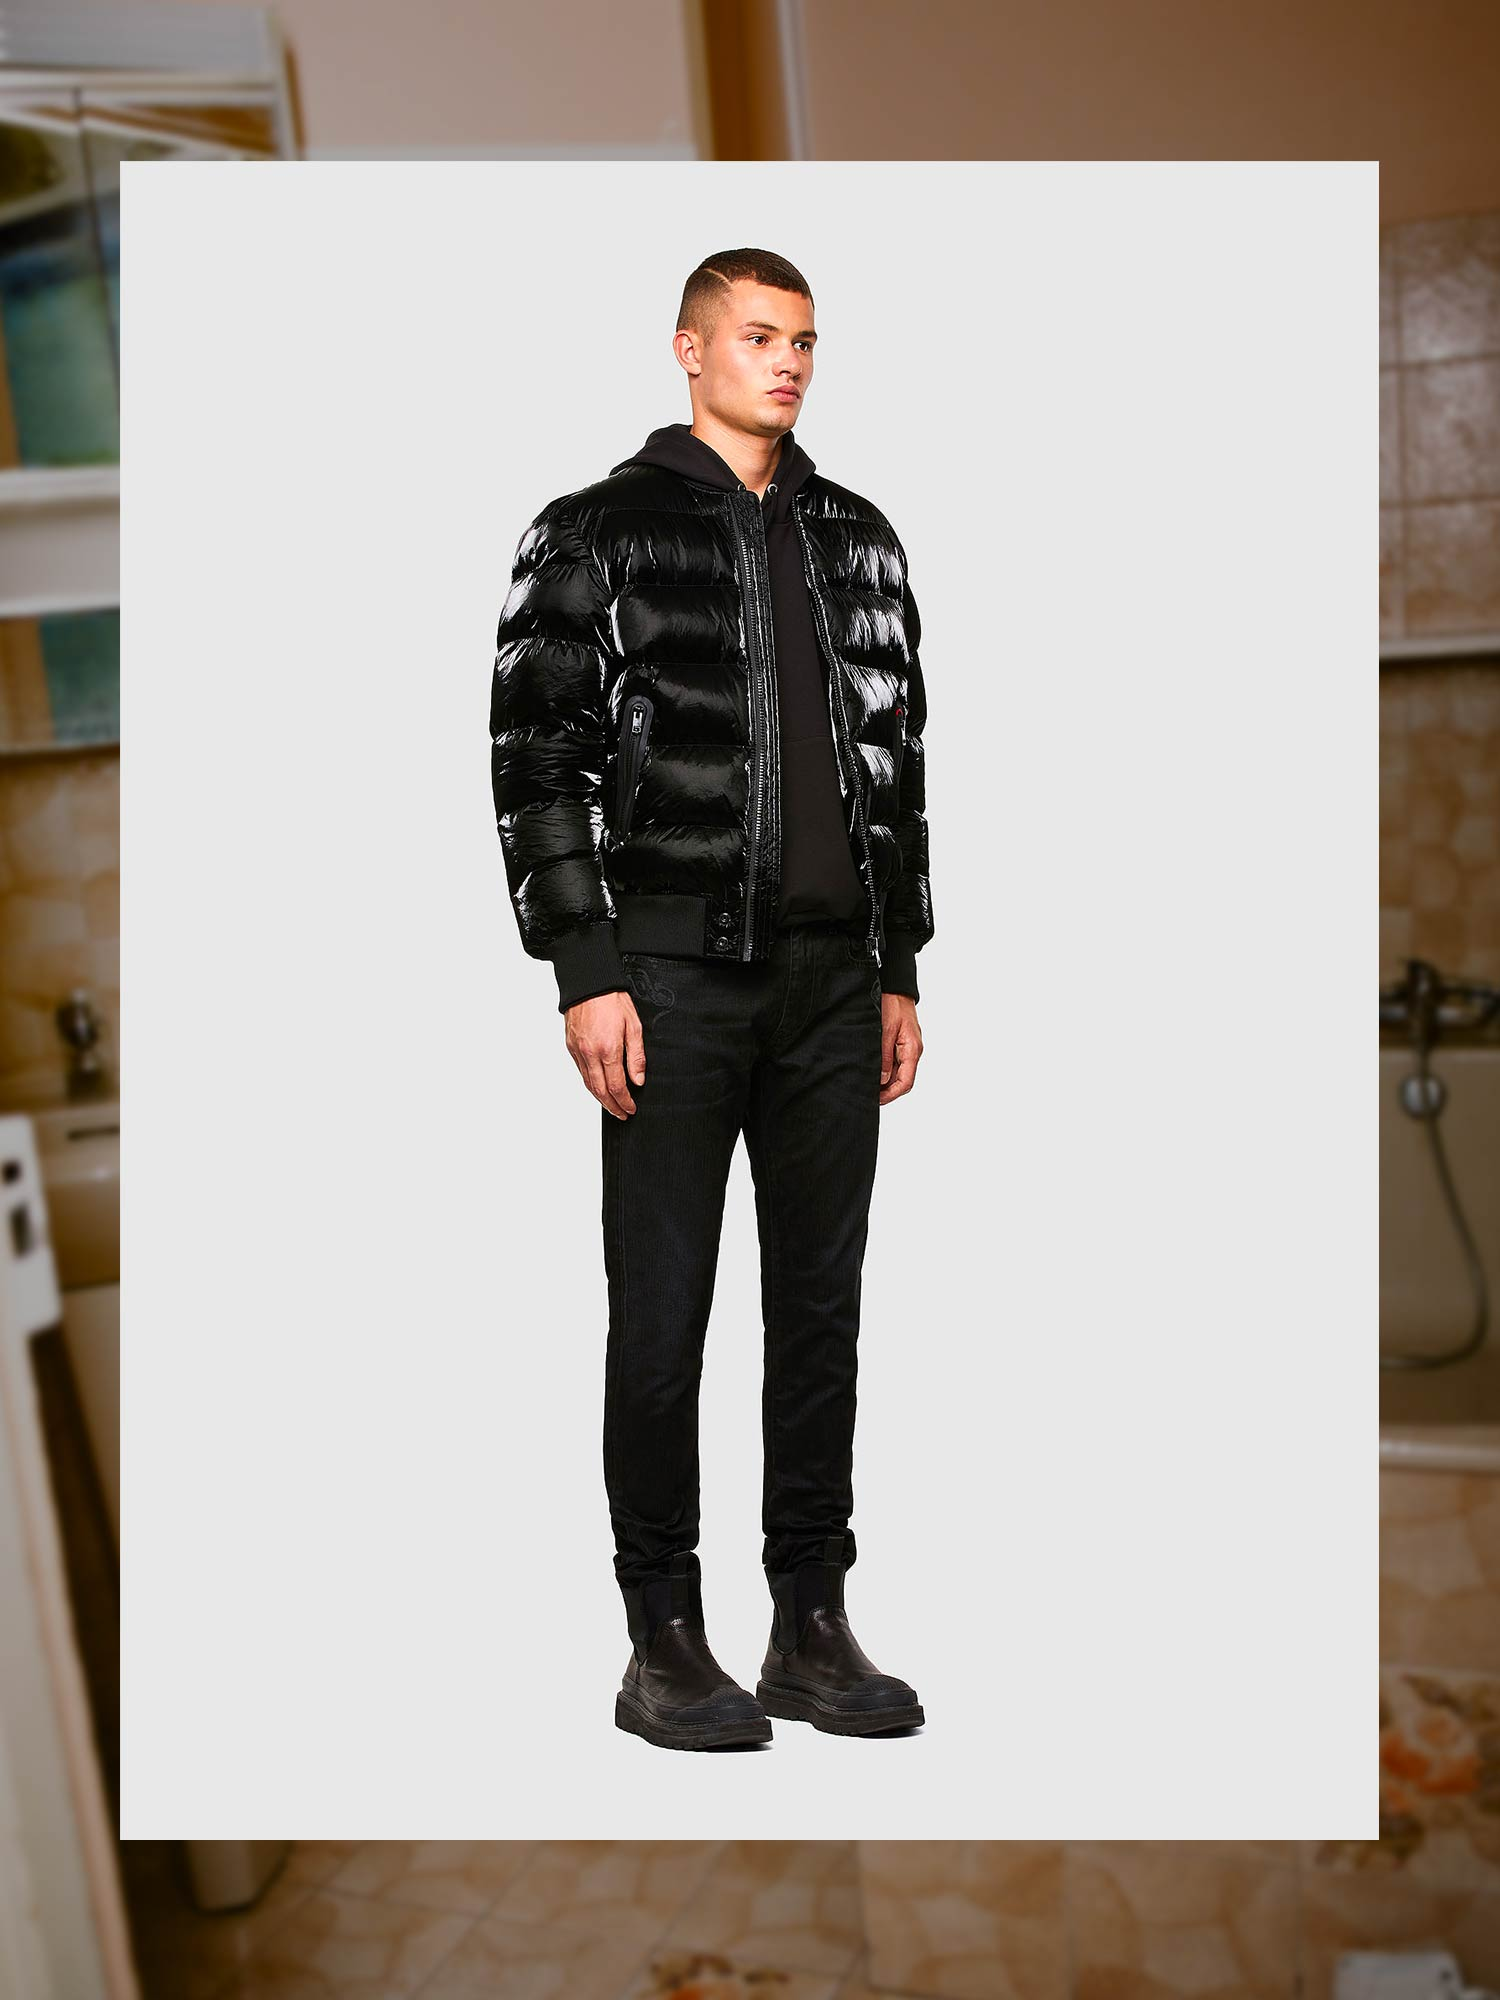 Diesel Jeans Slim Fit: D-Strukt | Shop Now on Diesel.com